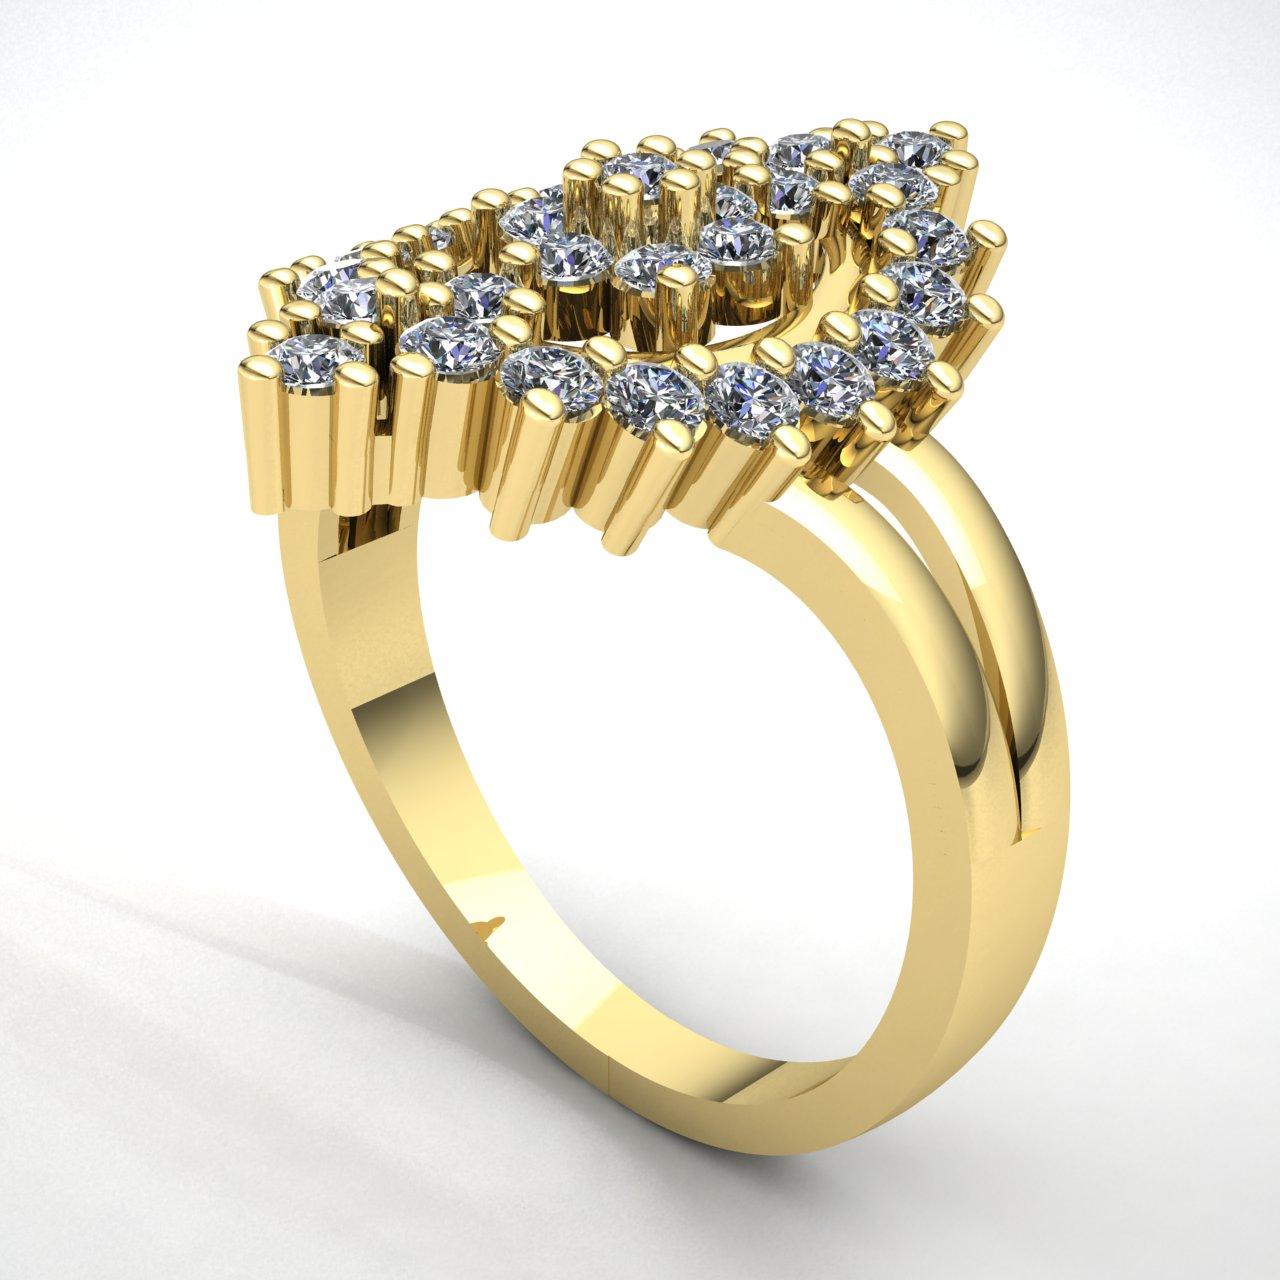 1-Quilate-Diamante-Brillante-Redondo-Mujer-Novia-Flor-Halo-Anillo-de-Compromiso miniatura 13